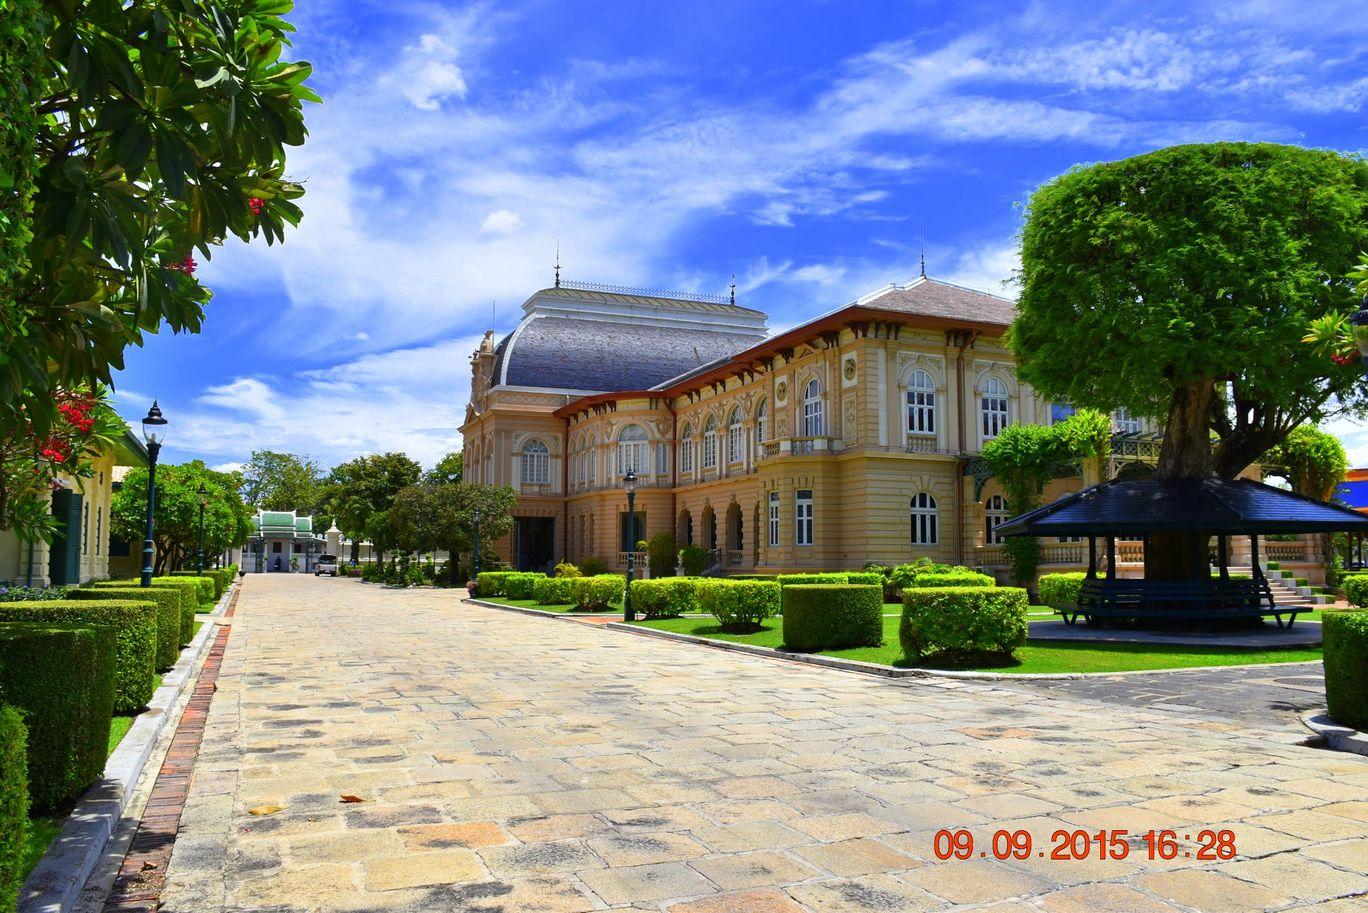 Photo of The Grand Palace By Pooja kaushik